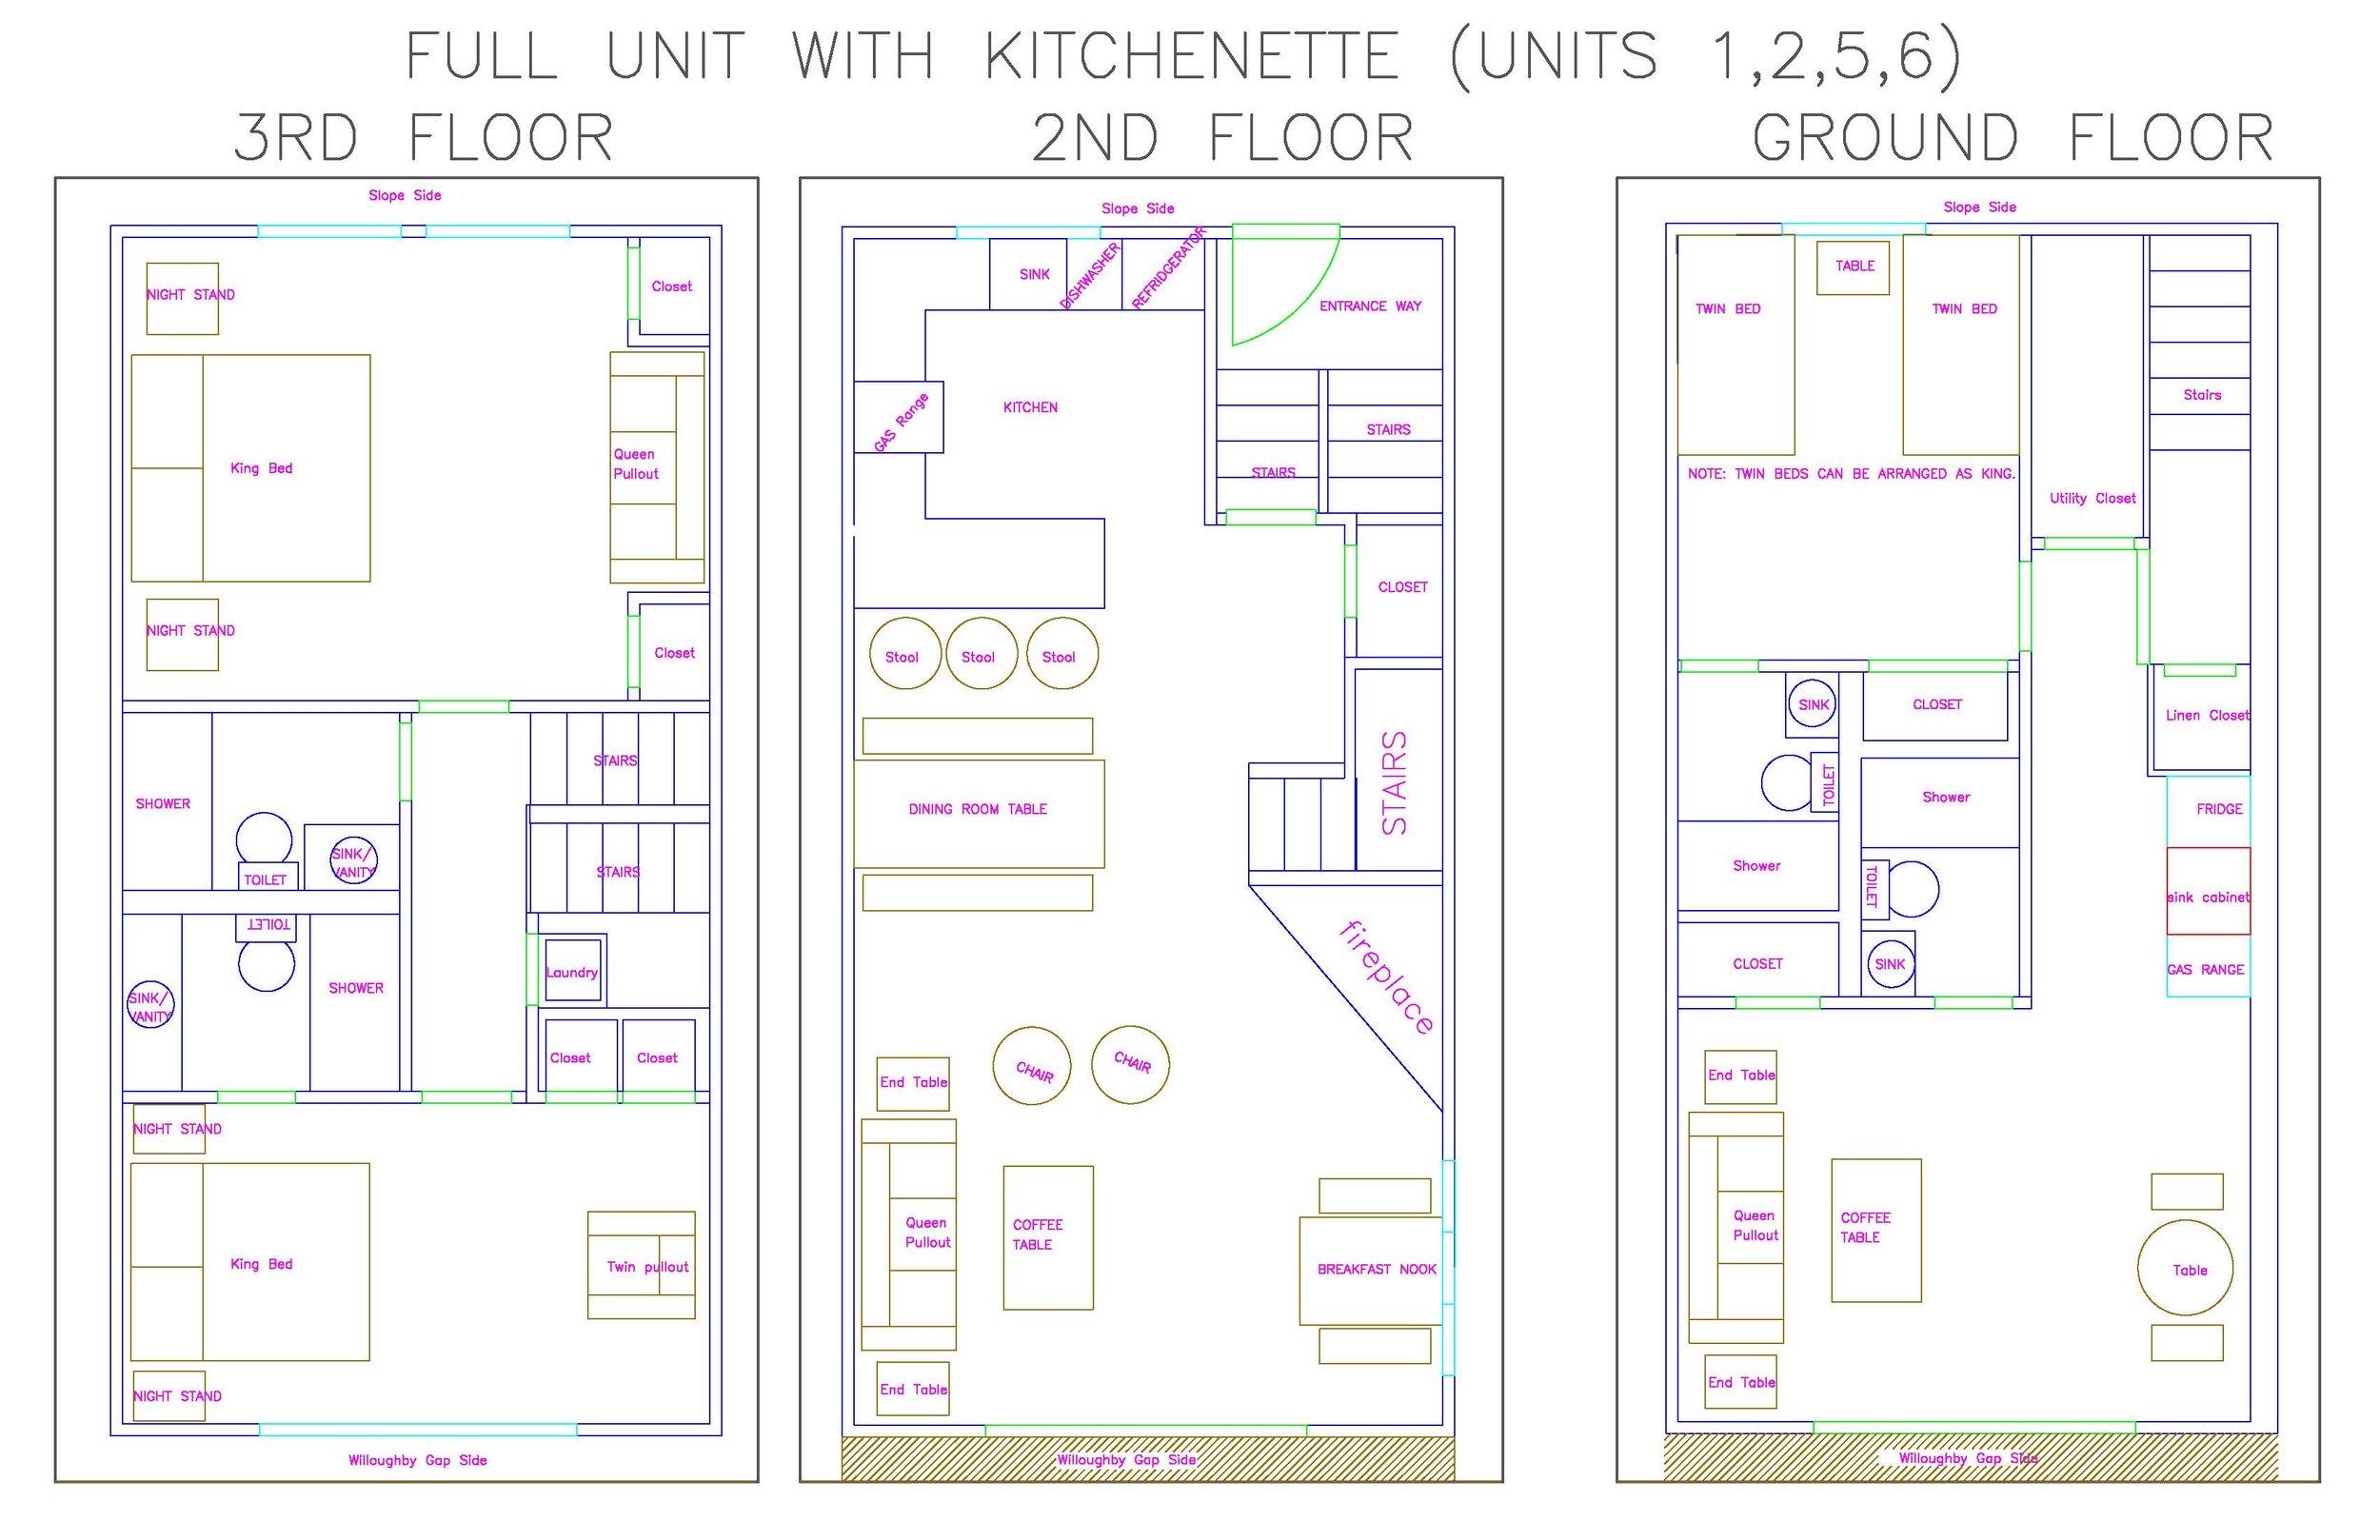 SnoBearFloorPlan_Current-Full Unit With Kitchenette.jpg